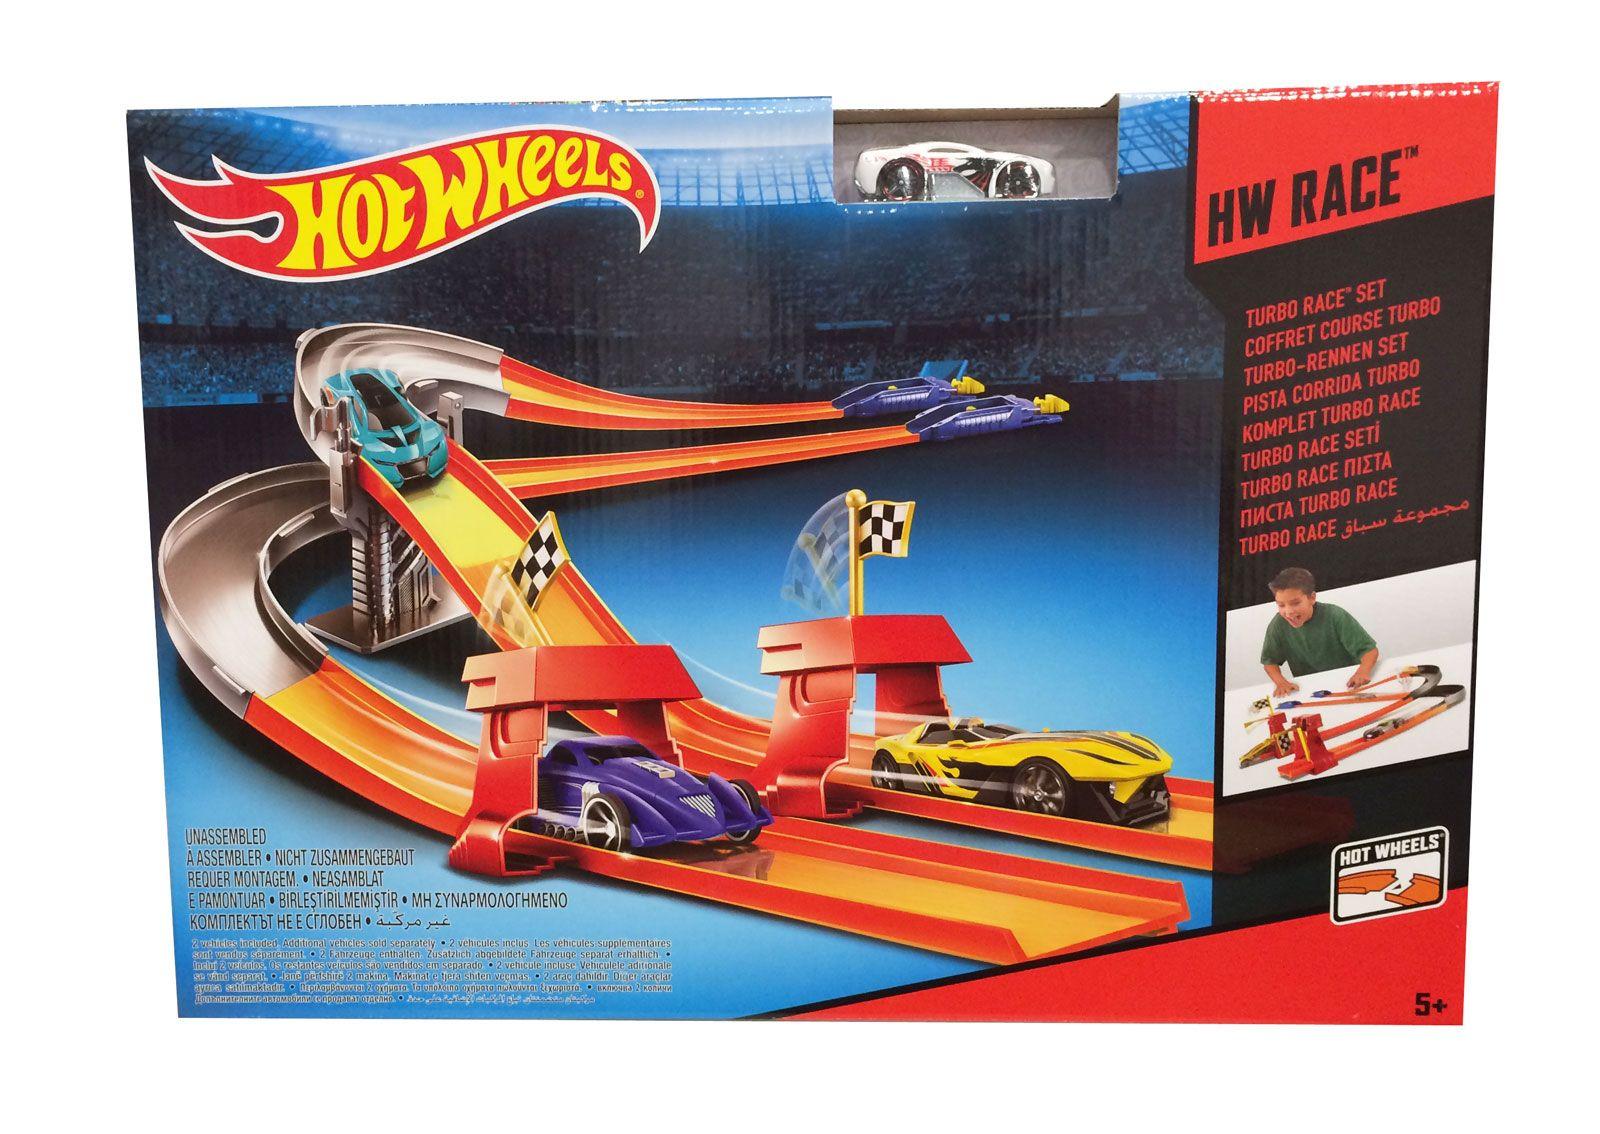 Hw hot wheels 2015 hw city 48 250 canyon carver police motorcycle - Hot Wheels Hw Race Turbo Race Set Bgj10 Manufacturer Mattel Enarxis Code